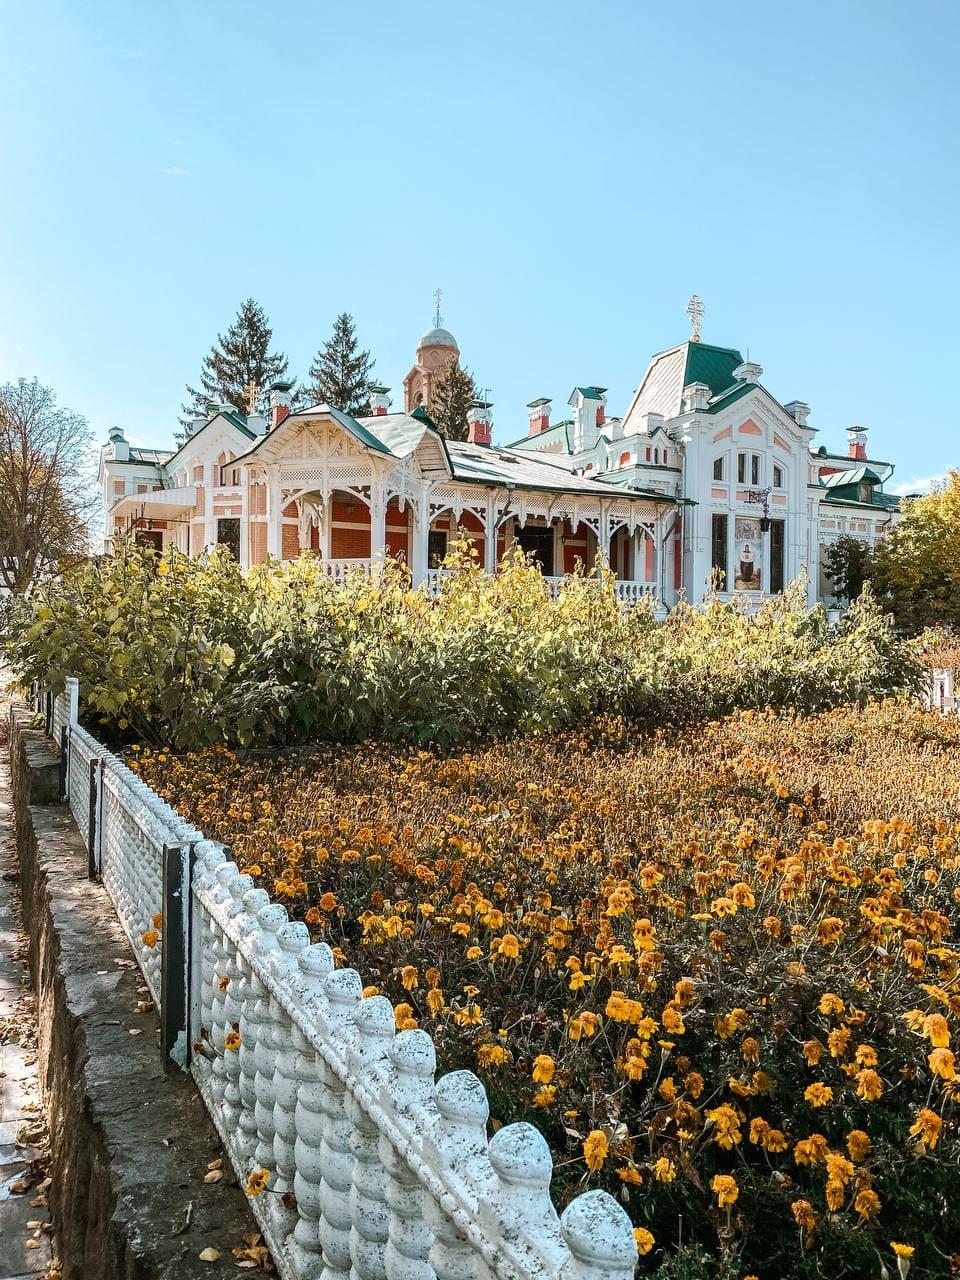 Садиба Хоєцьких або Свято-Богородичий Ризоположницький чоловічий монастир.